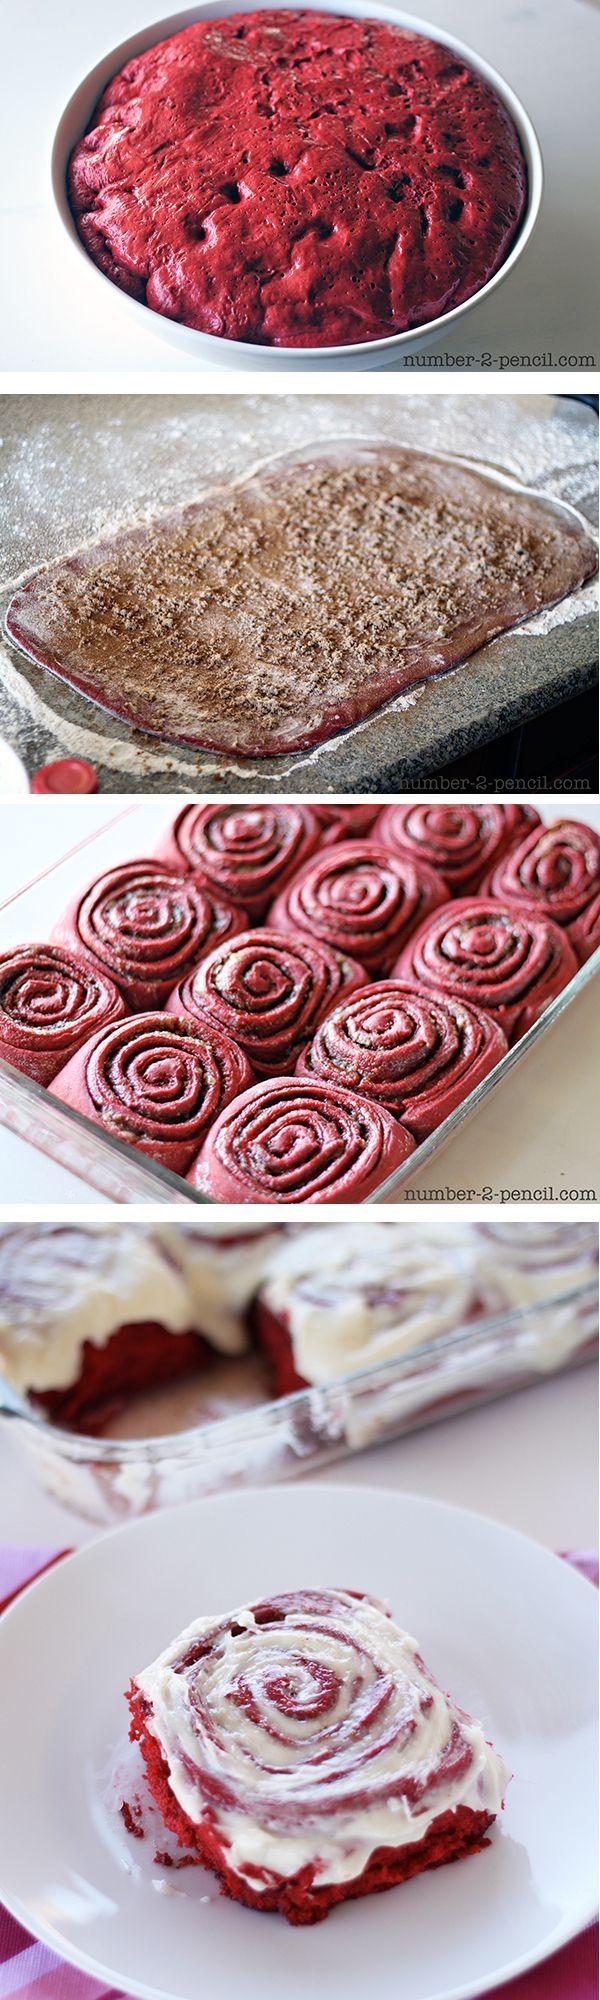 Red Velvet Cake Mix Cinnamon Rolls recipe